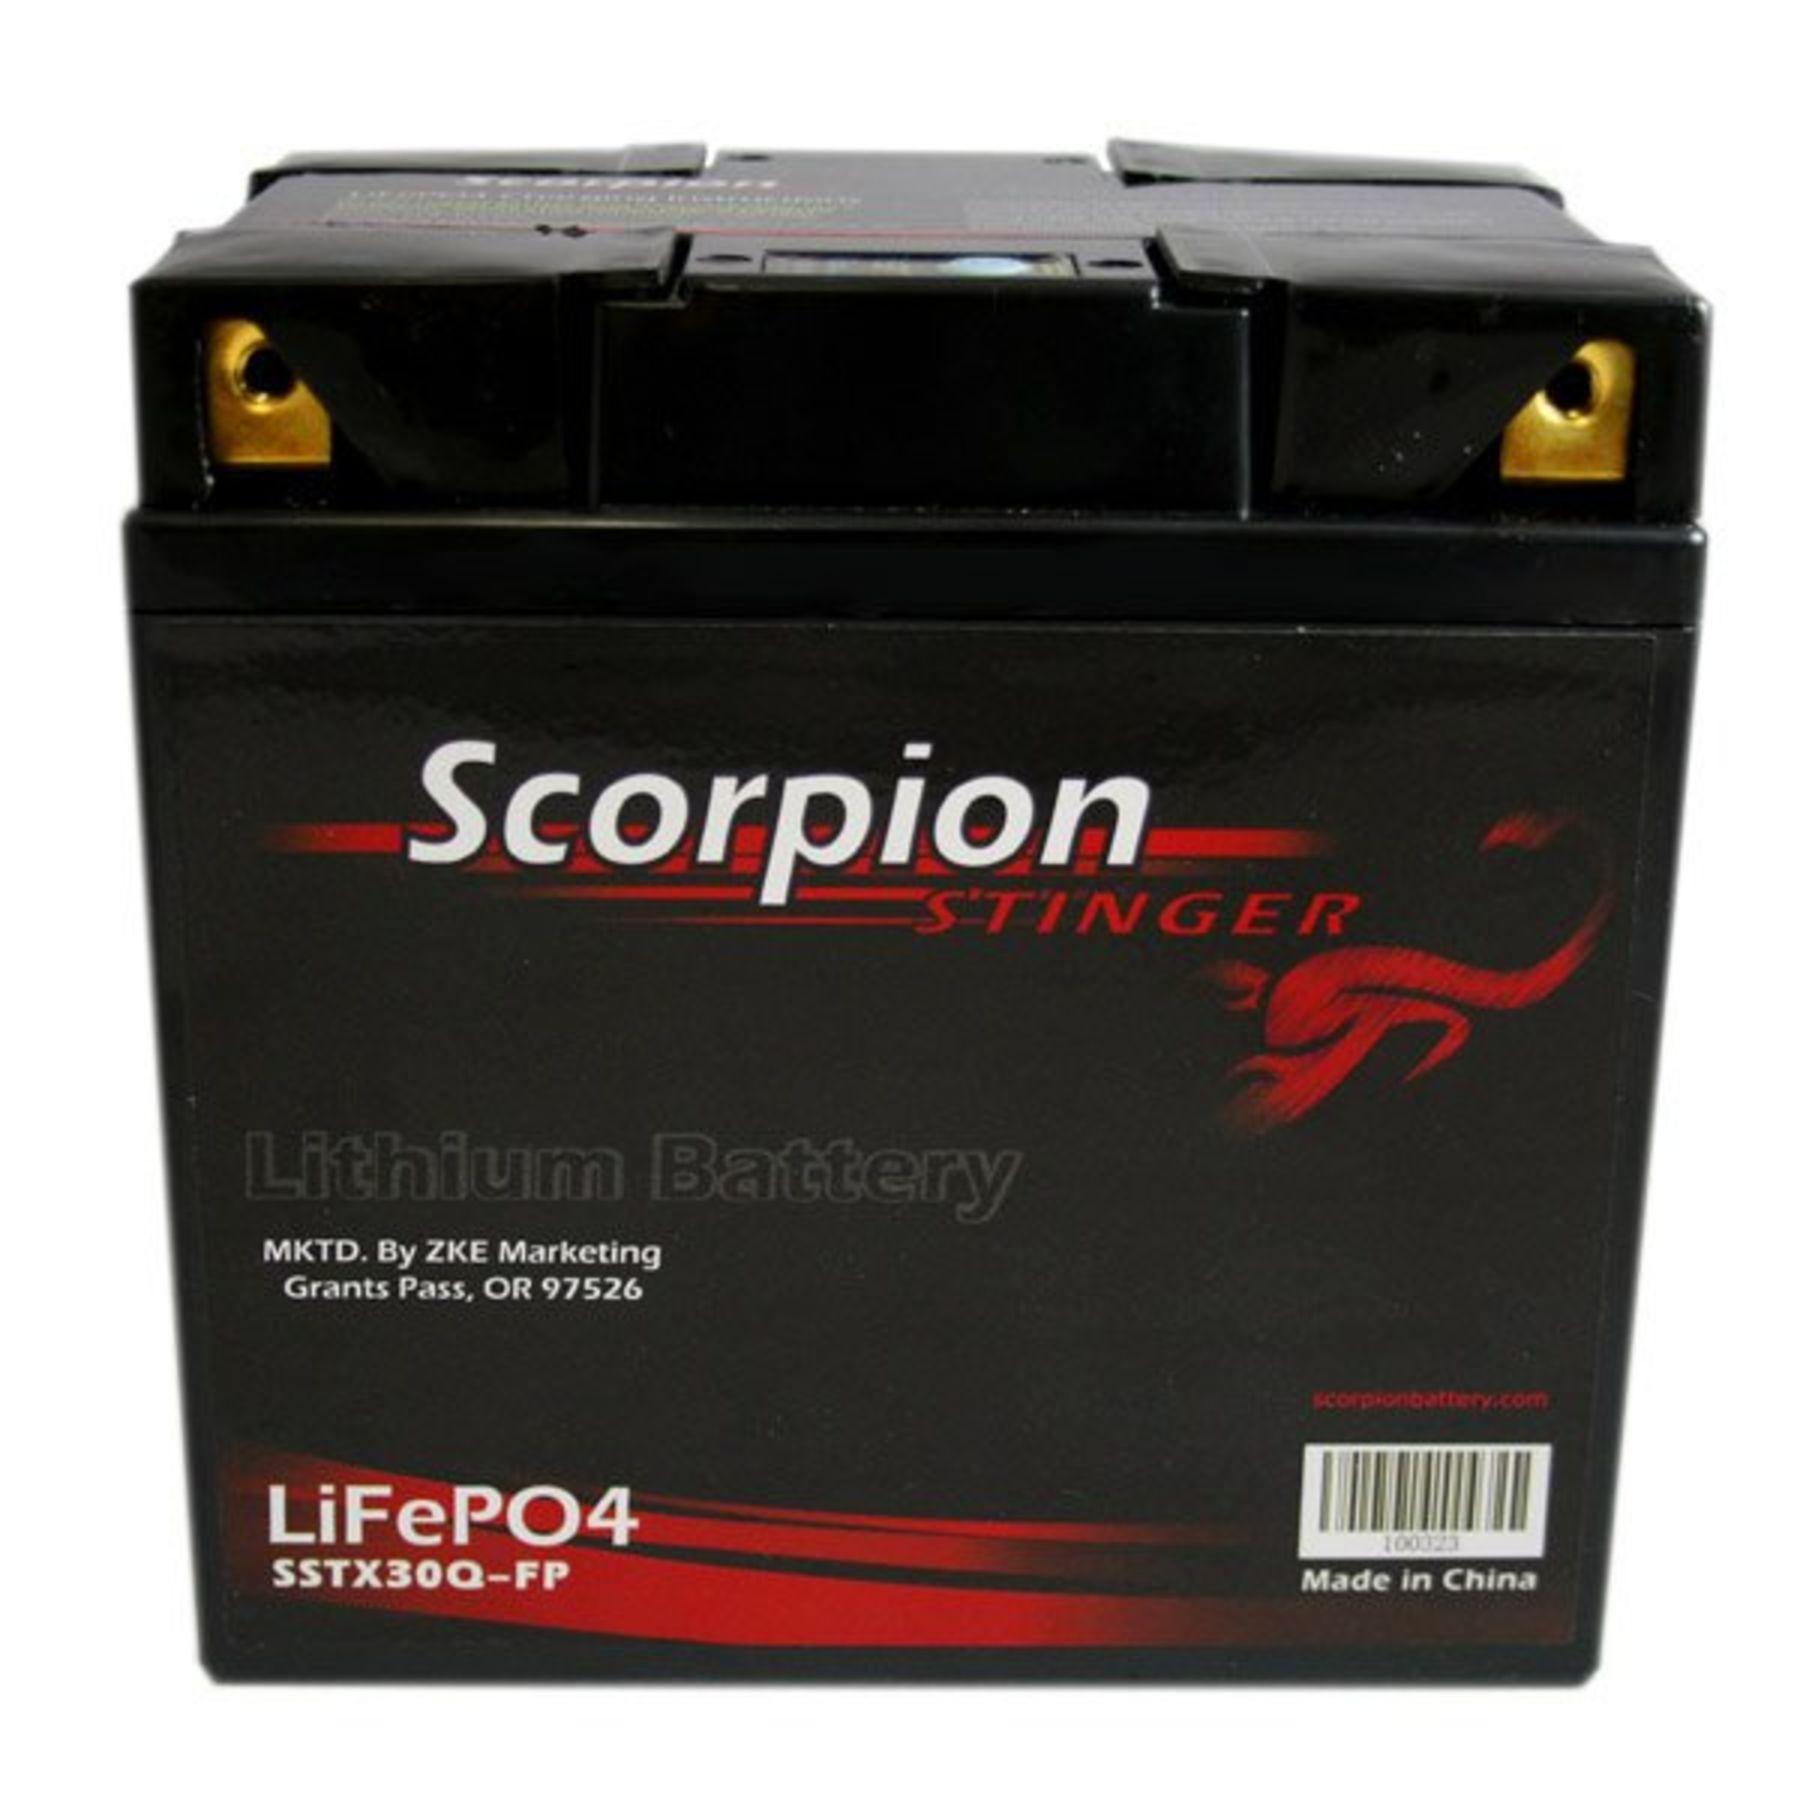 SSTX30Q-FP Scorpion Stinger 12v 540 CCA LiFePo4 Quad Terminal Extreme High  Output Battery